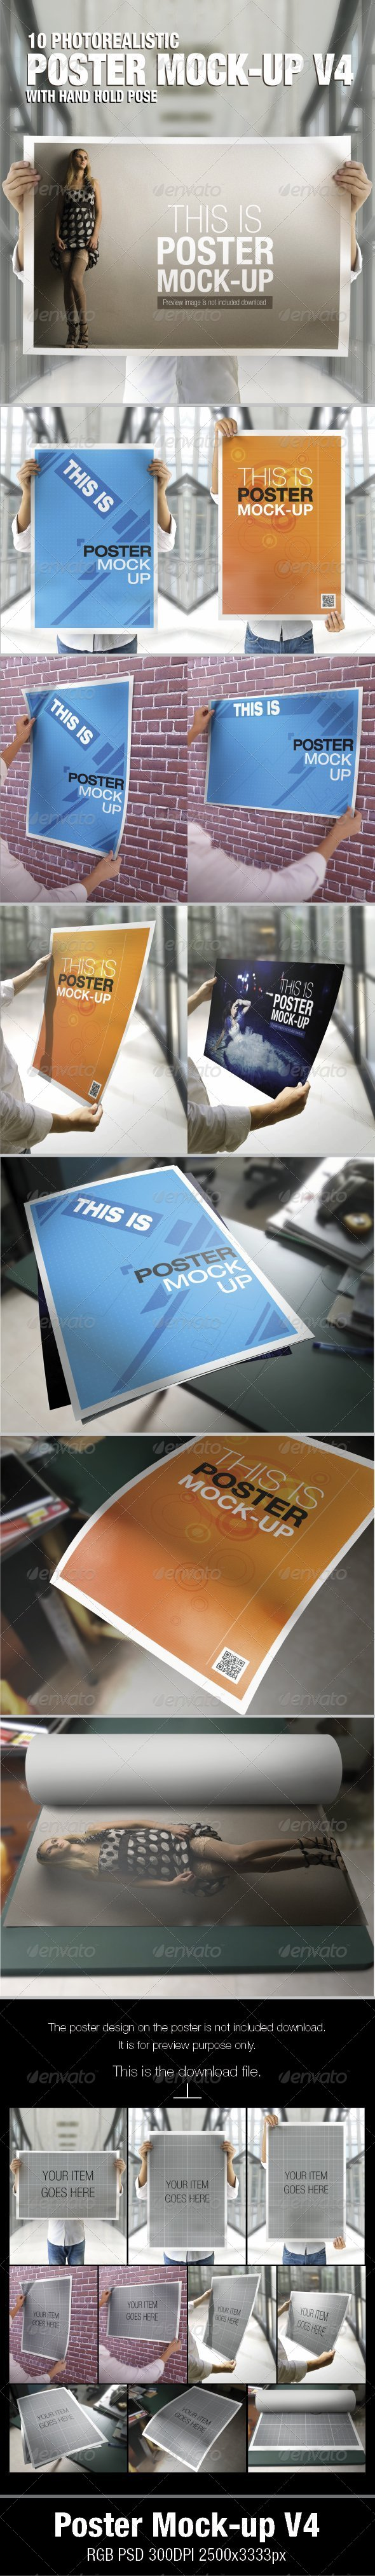 Poster Mock-Up V4 - Posters Print